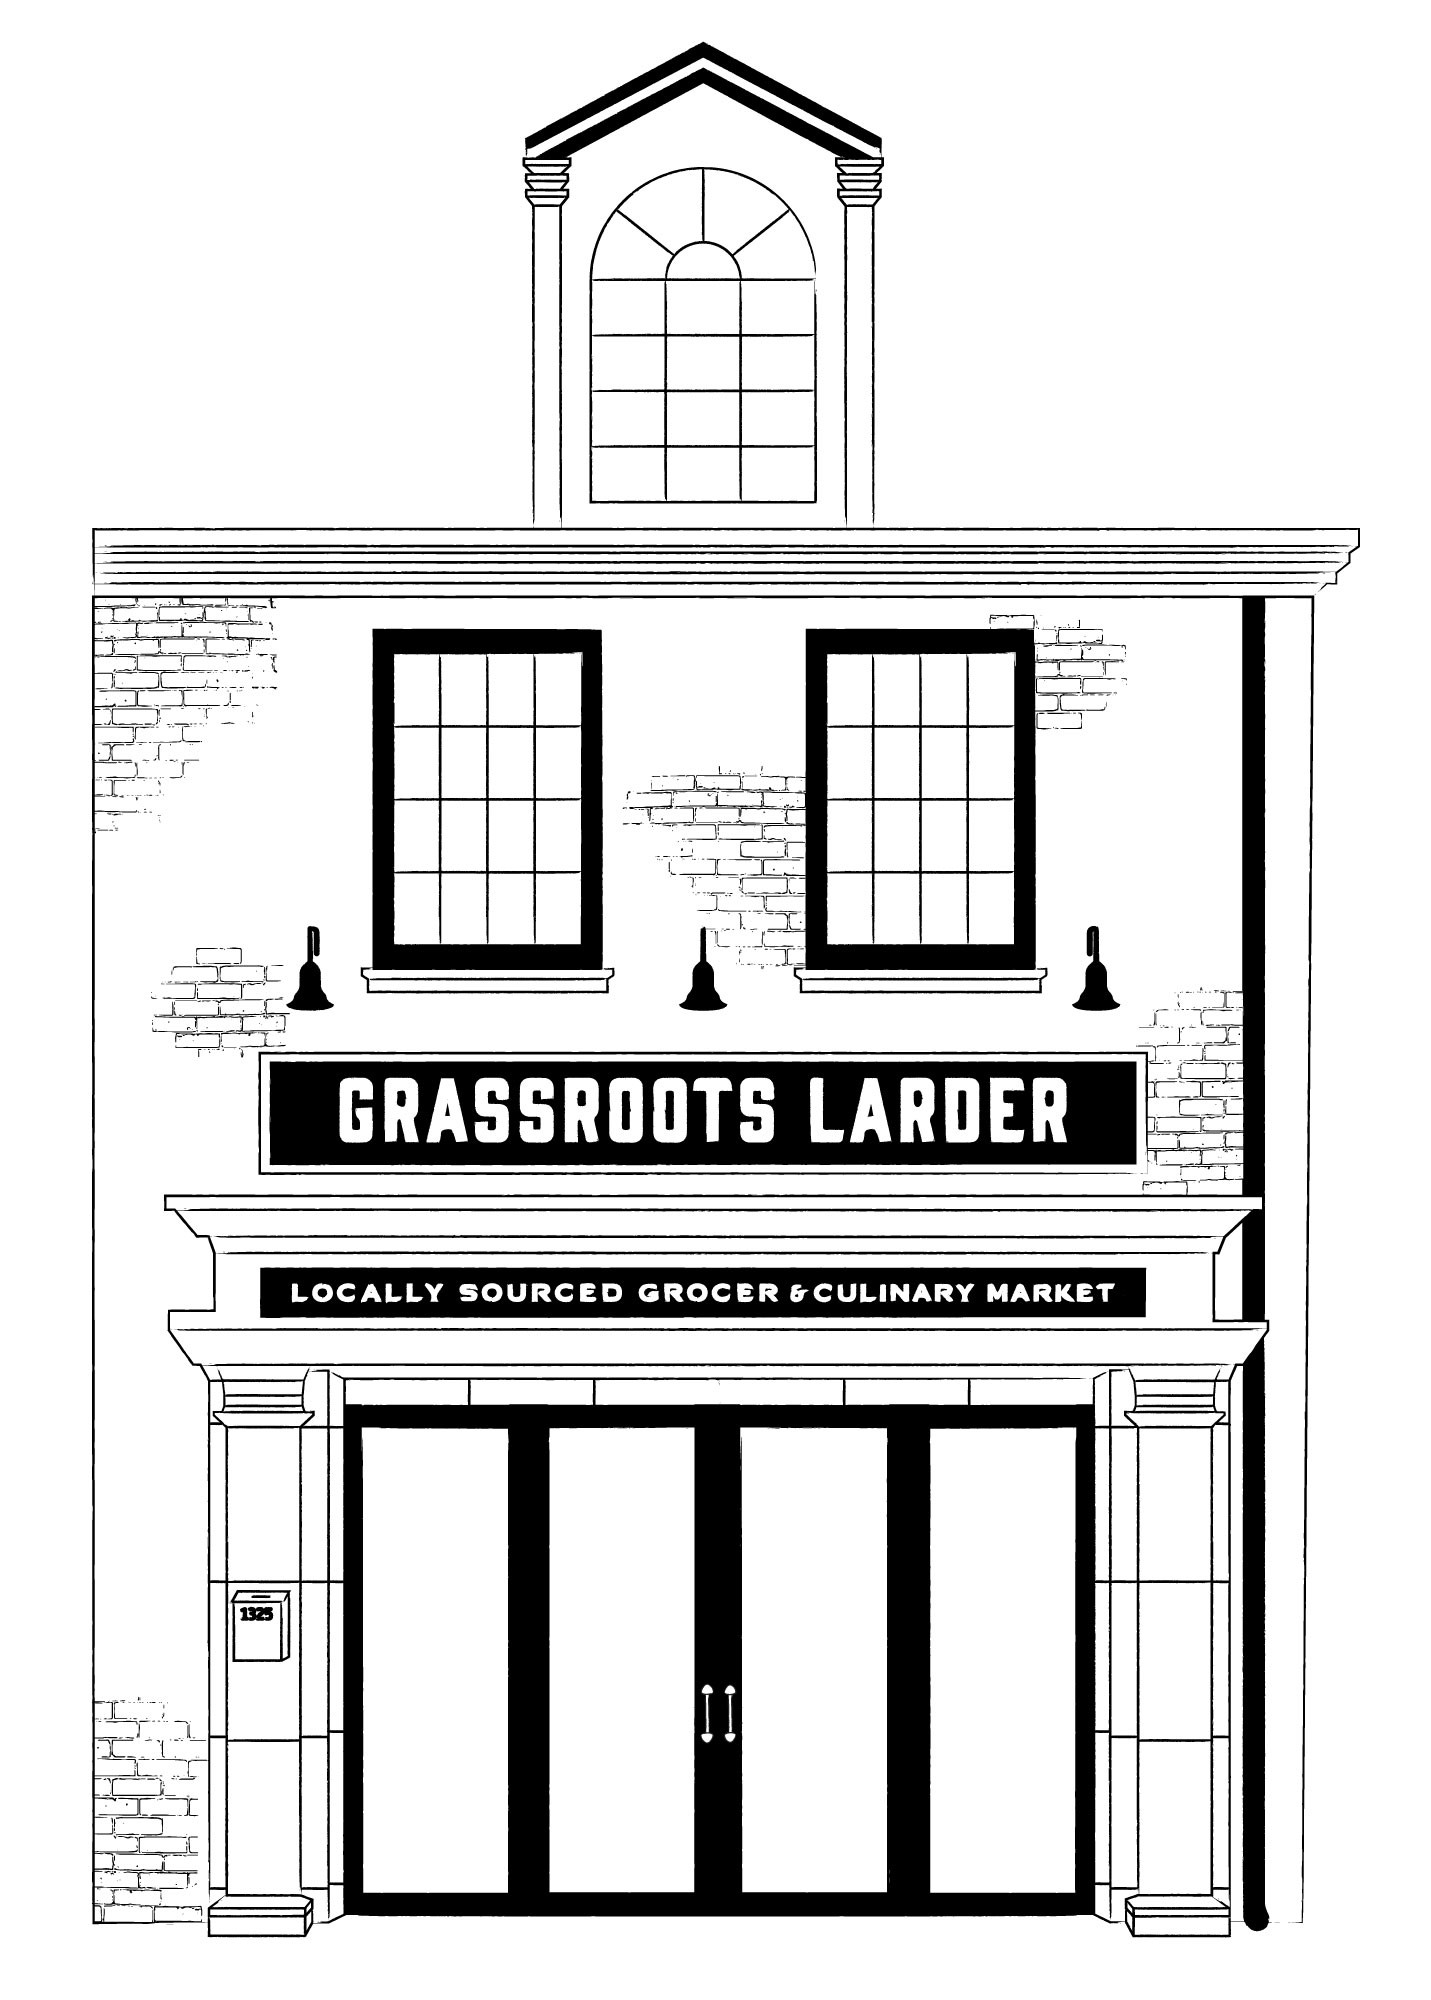 Grassroots Larder